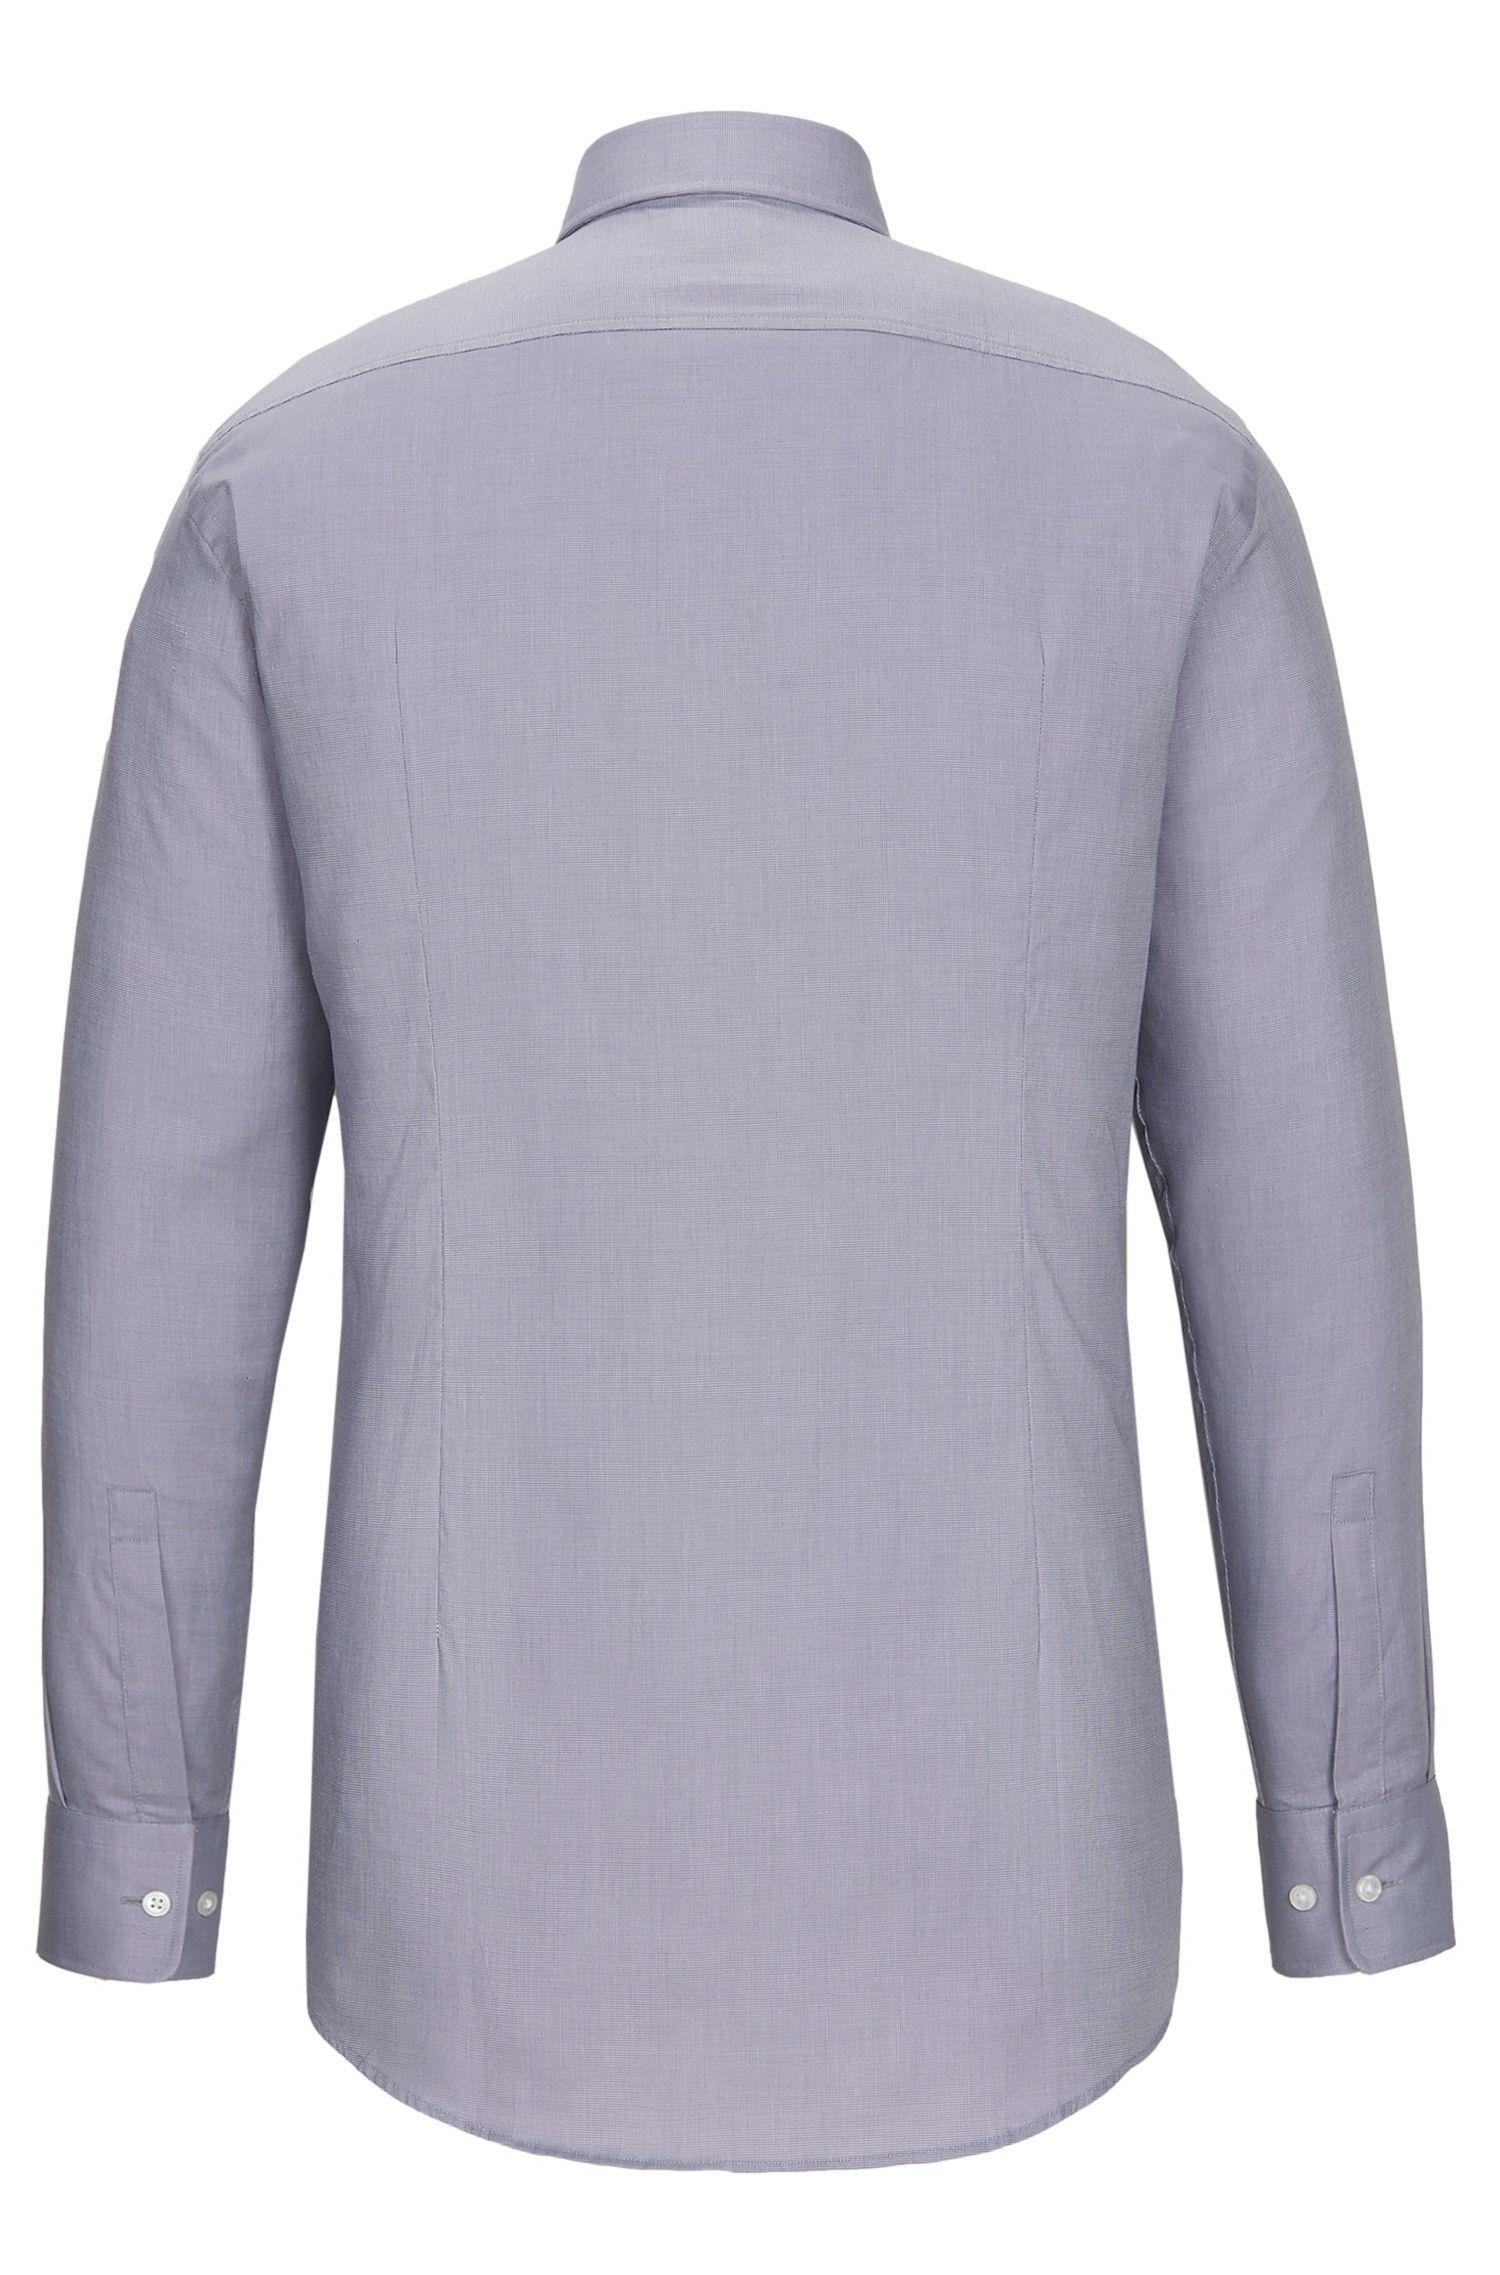 Nailhead Cotton Dress Shirt, Sharp Fit| Marley US